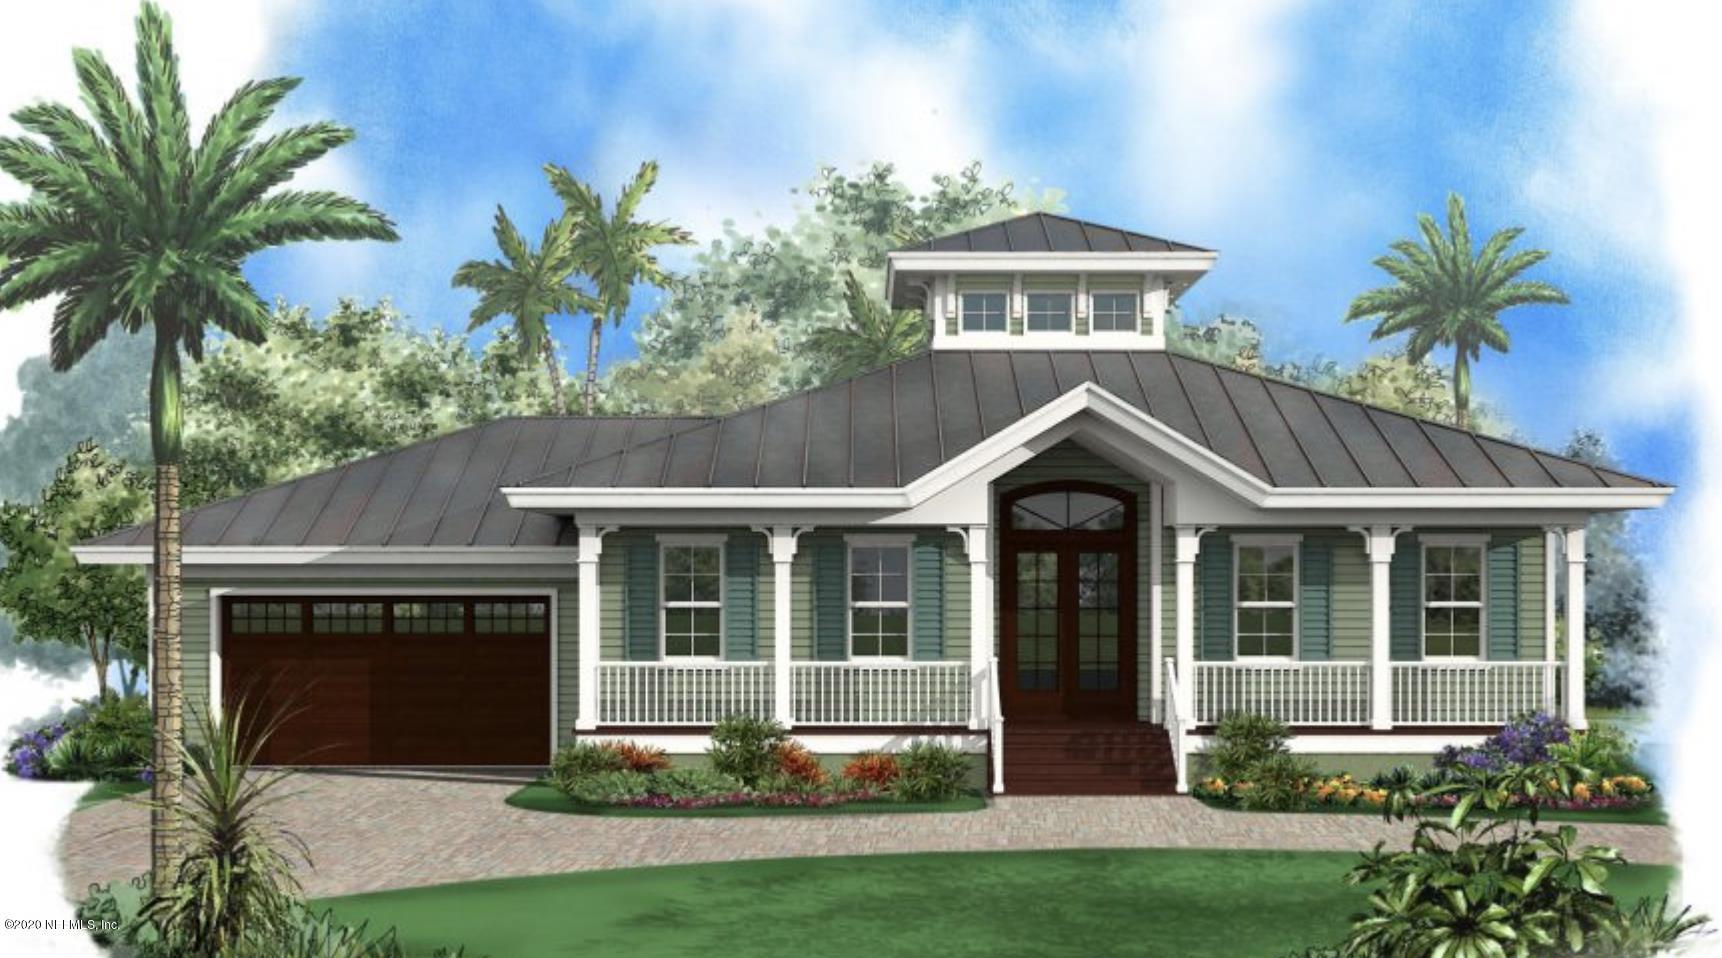 139 HARTFORD, HAWTHORNE, FLORIDA 32640, 3 Bedrooms Bedrooms, ,2 BathroomsBathrooms,Residential,For sale,HARTFORD,1052896